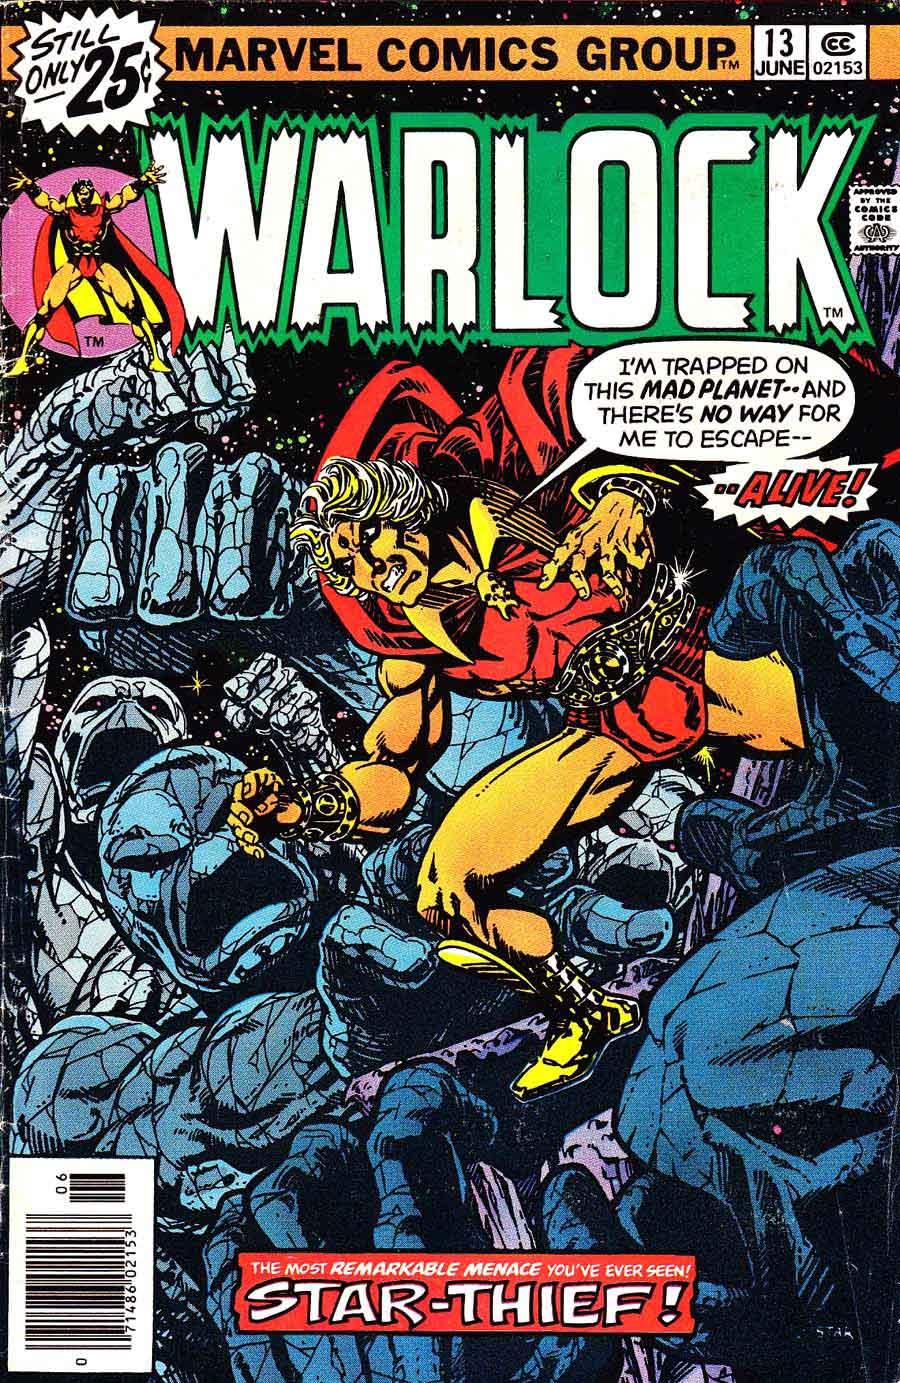 Warlock v1 #13 marvel 1970s bronze age comic book cover art by Jim Starlin